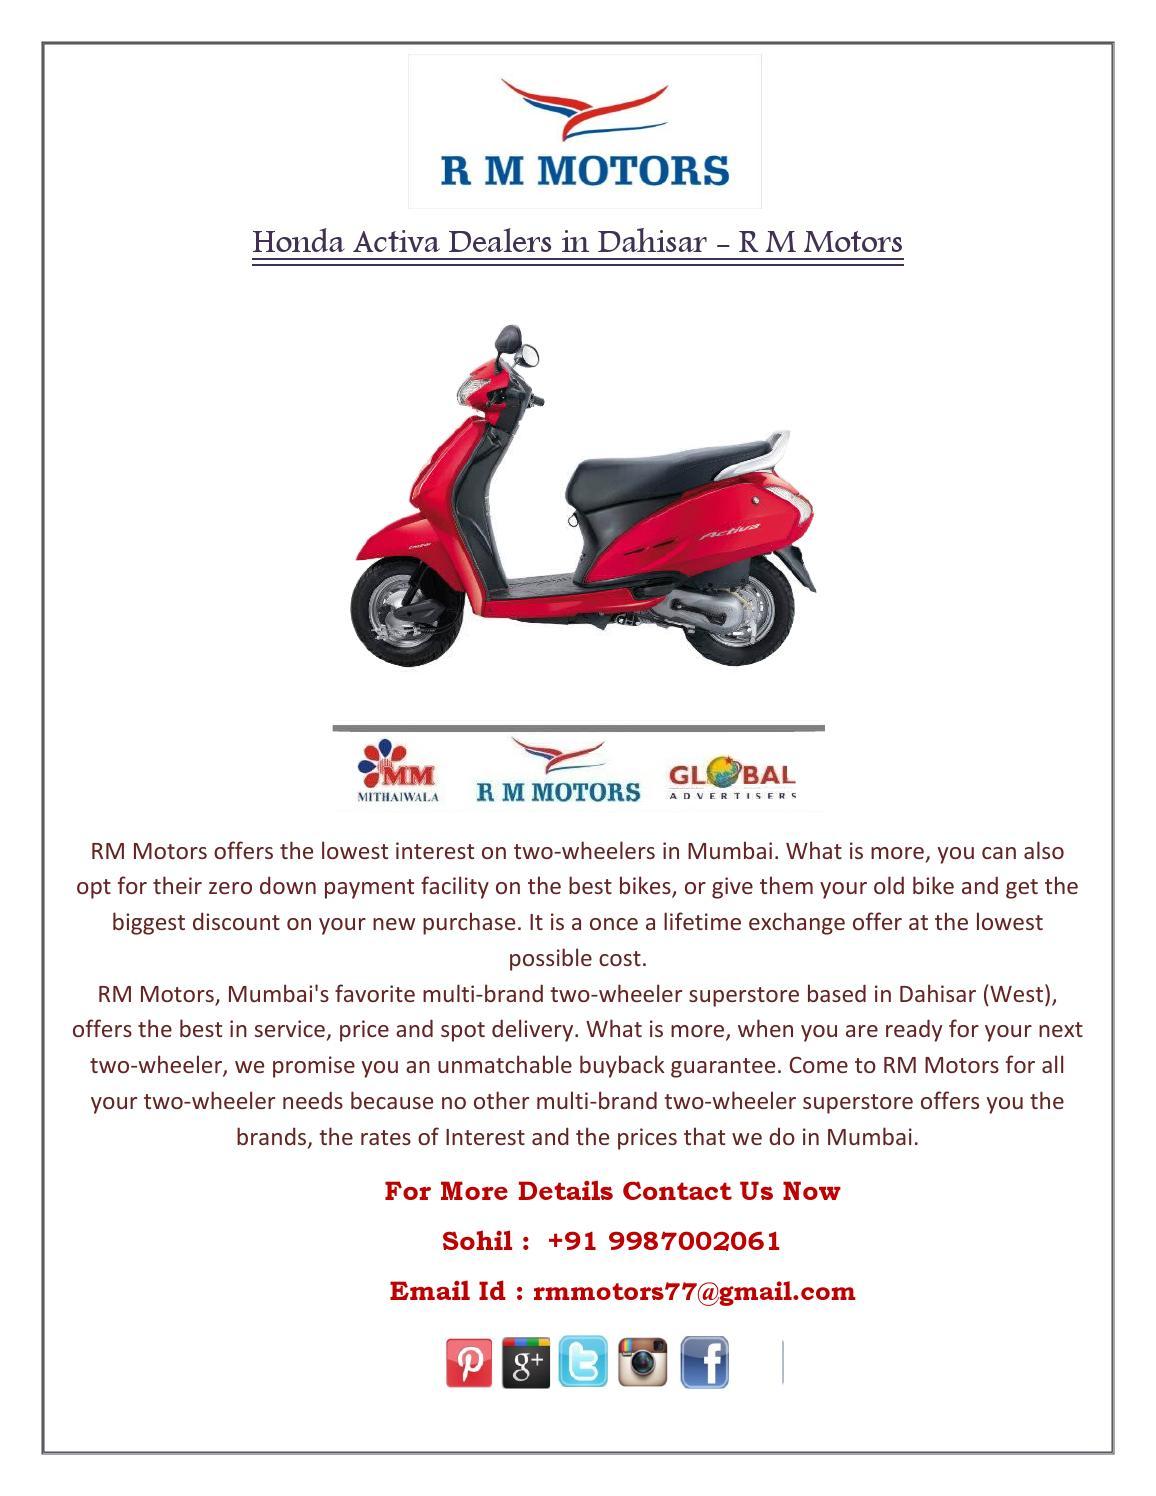 Multi brand two wheeler showrooms in bangalore dating 7